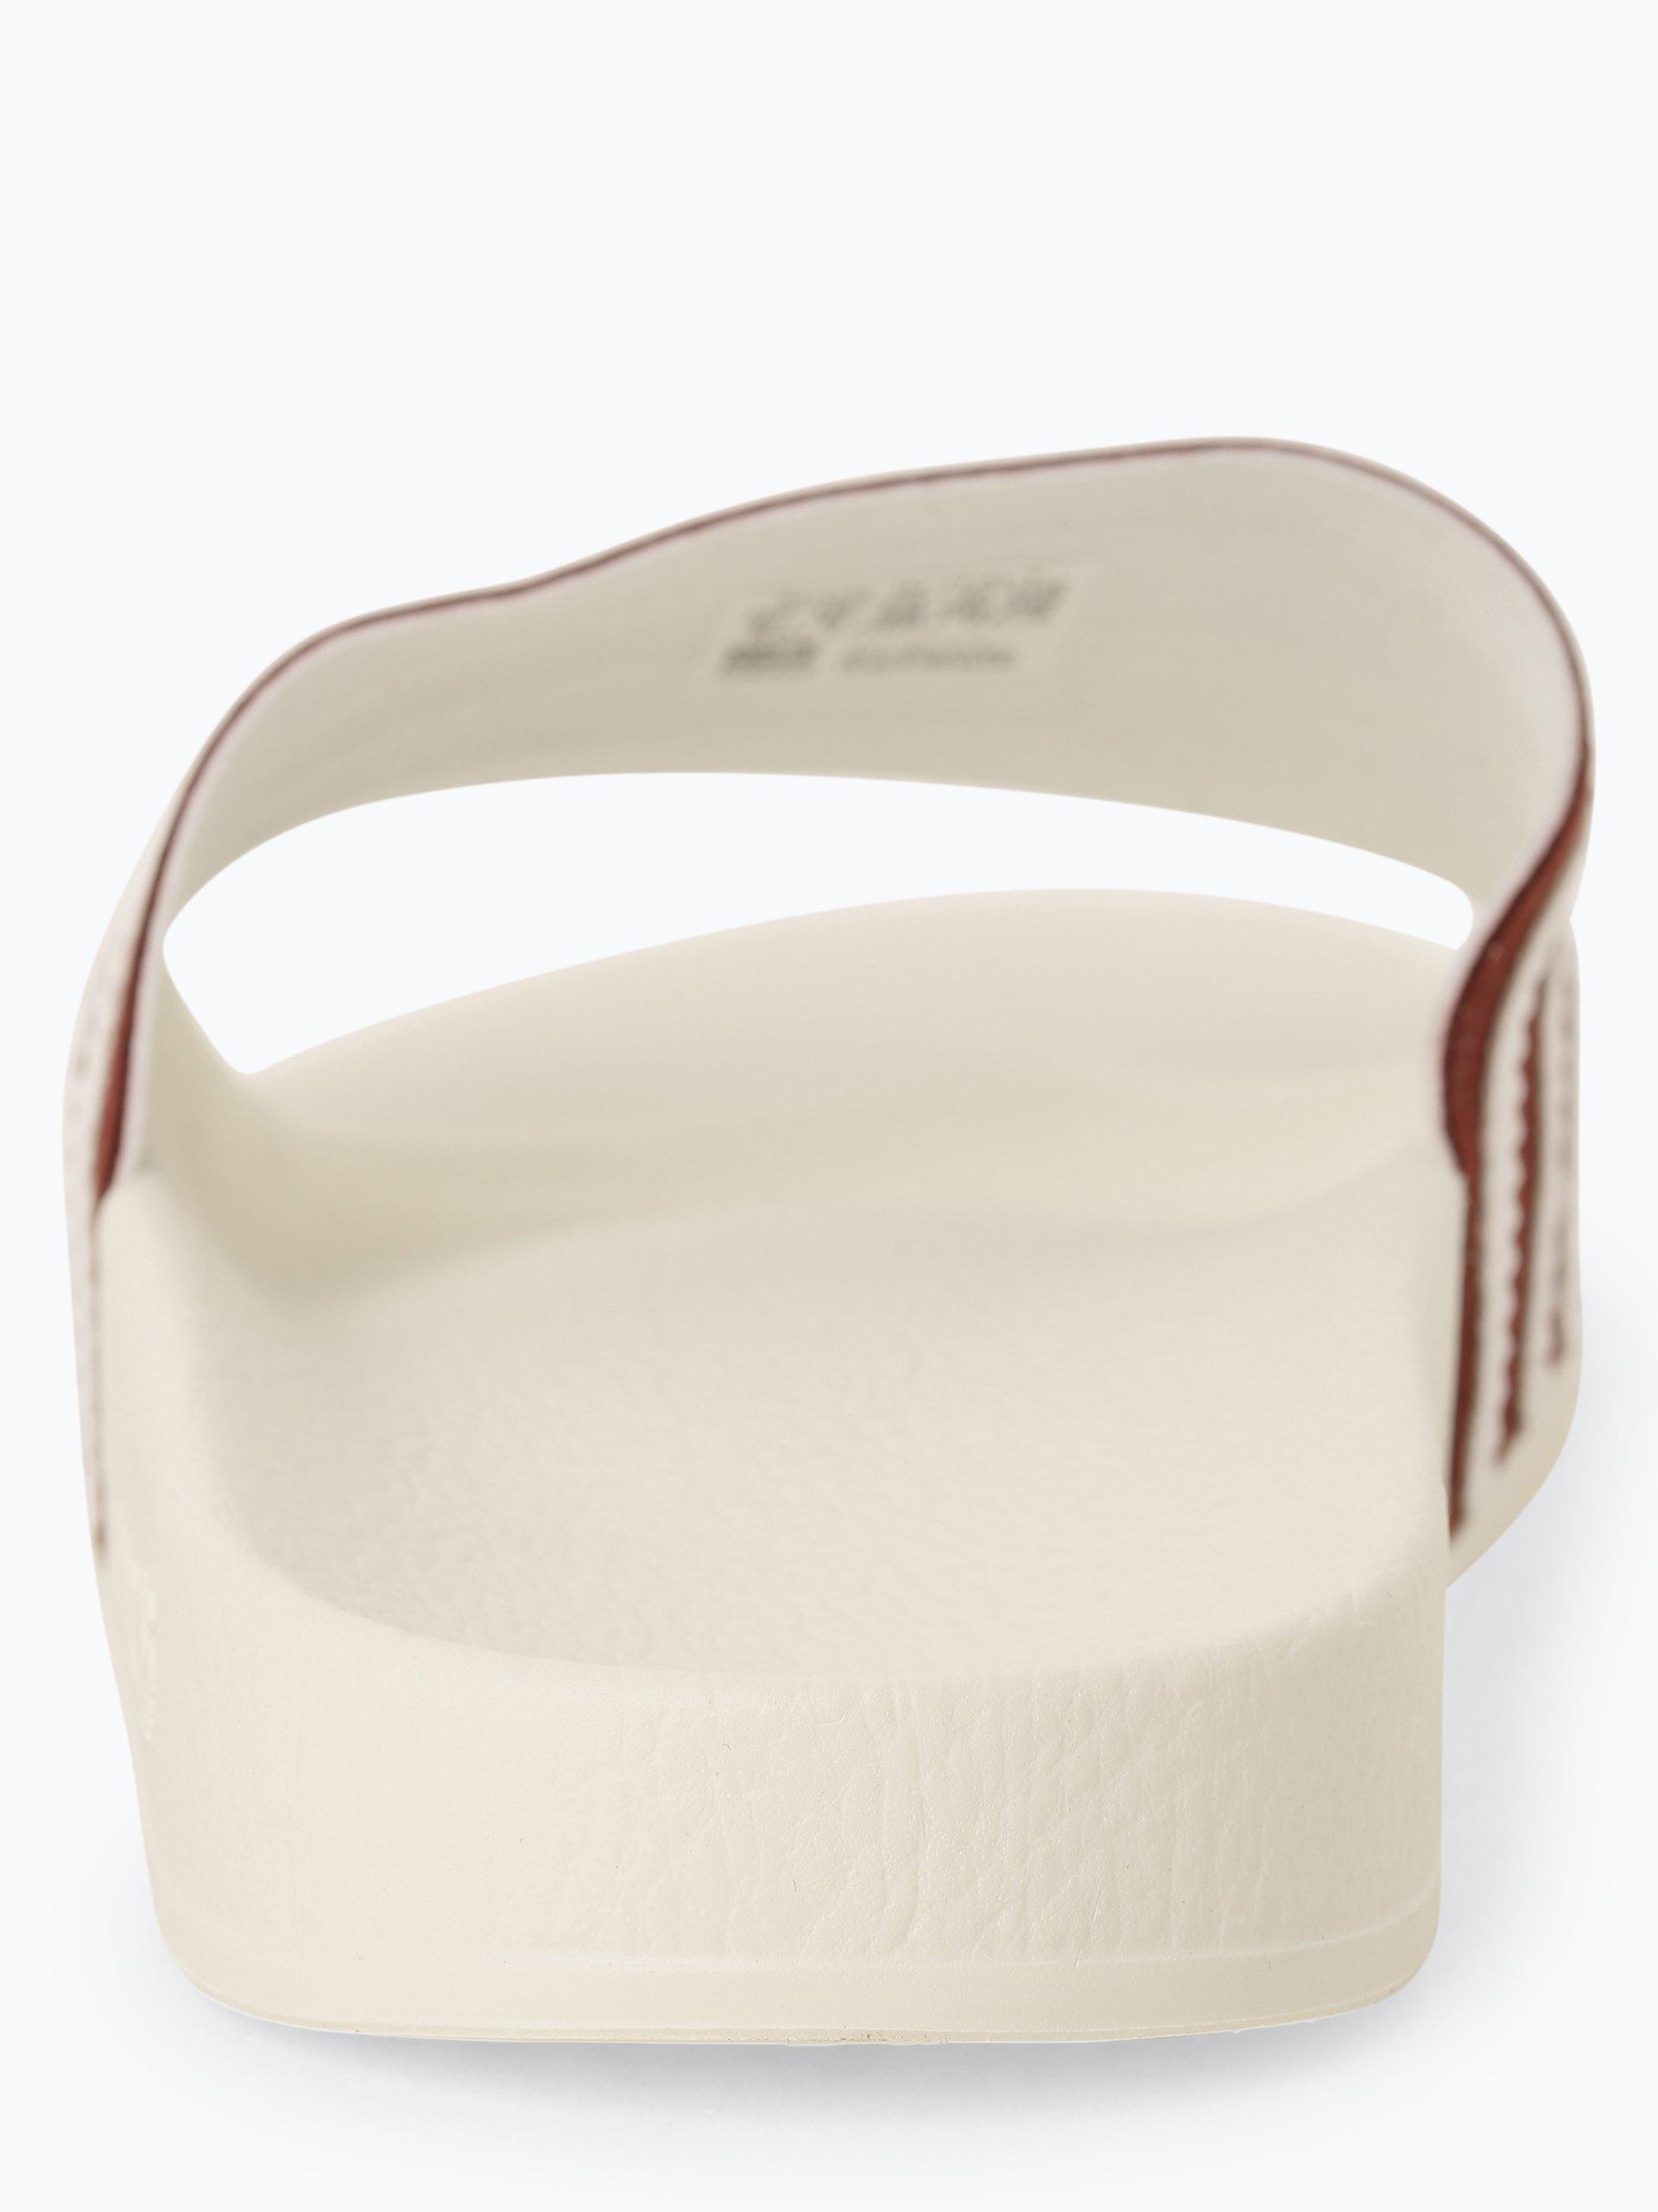 adidas Originals Damskie pantofle kąpielowe – Adilette